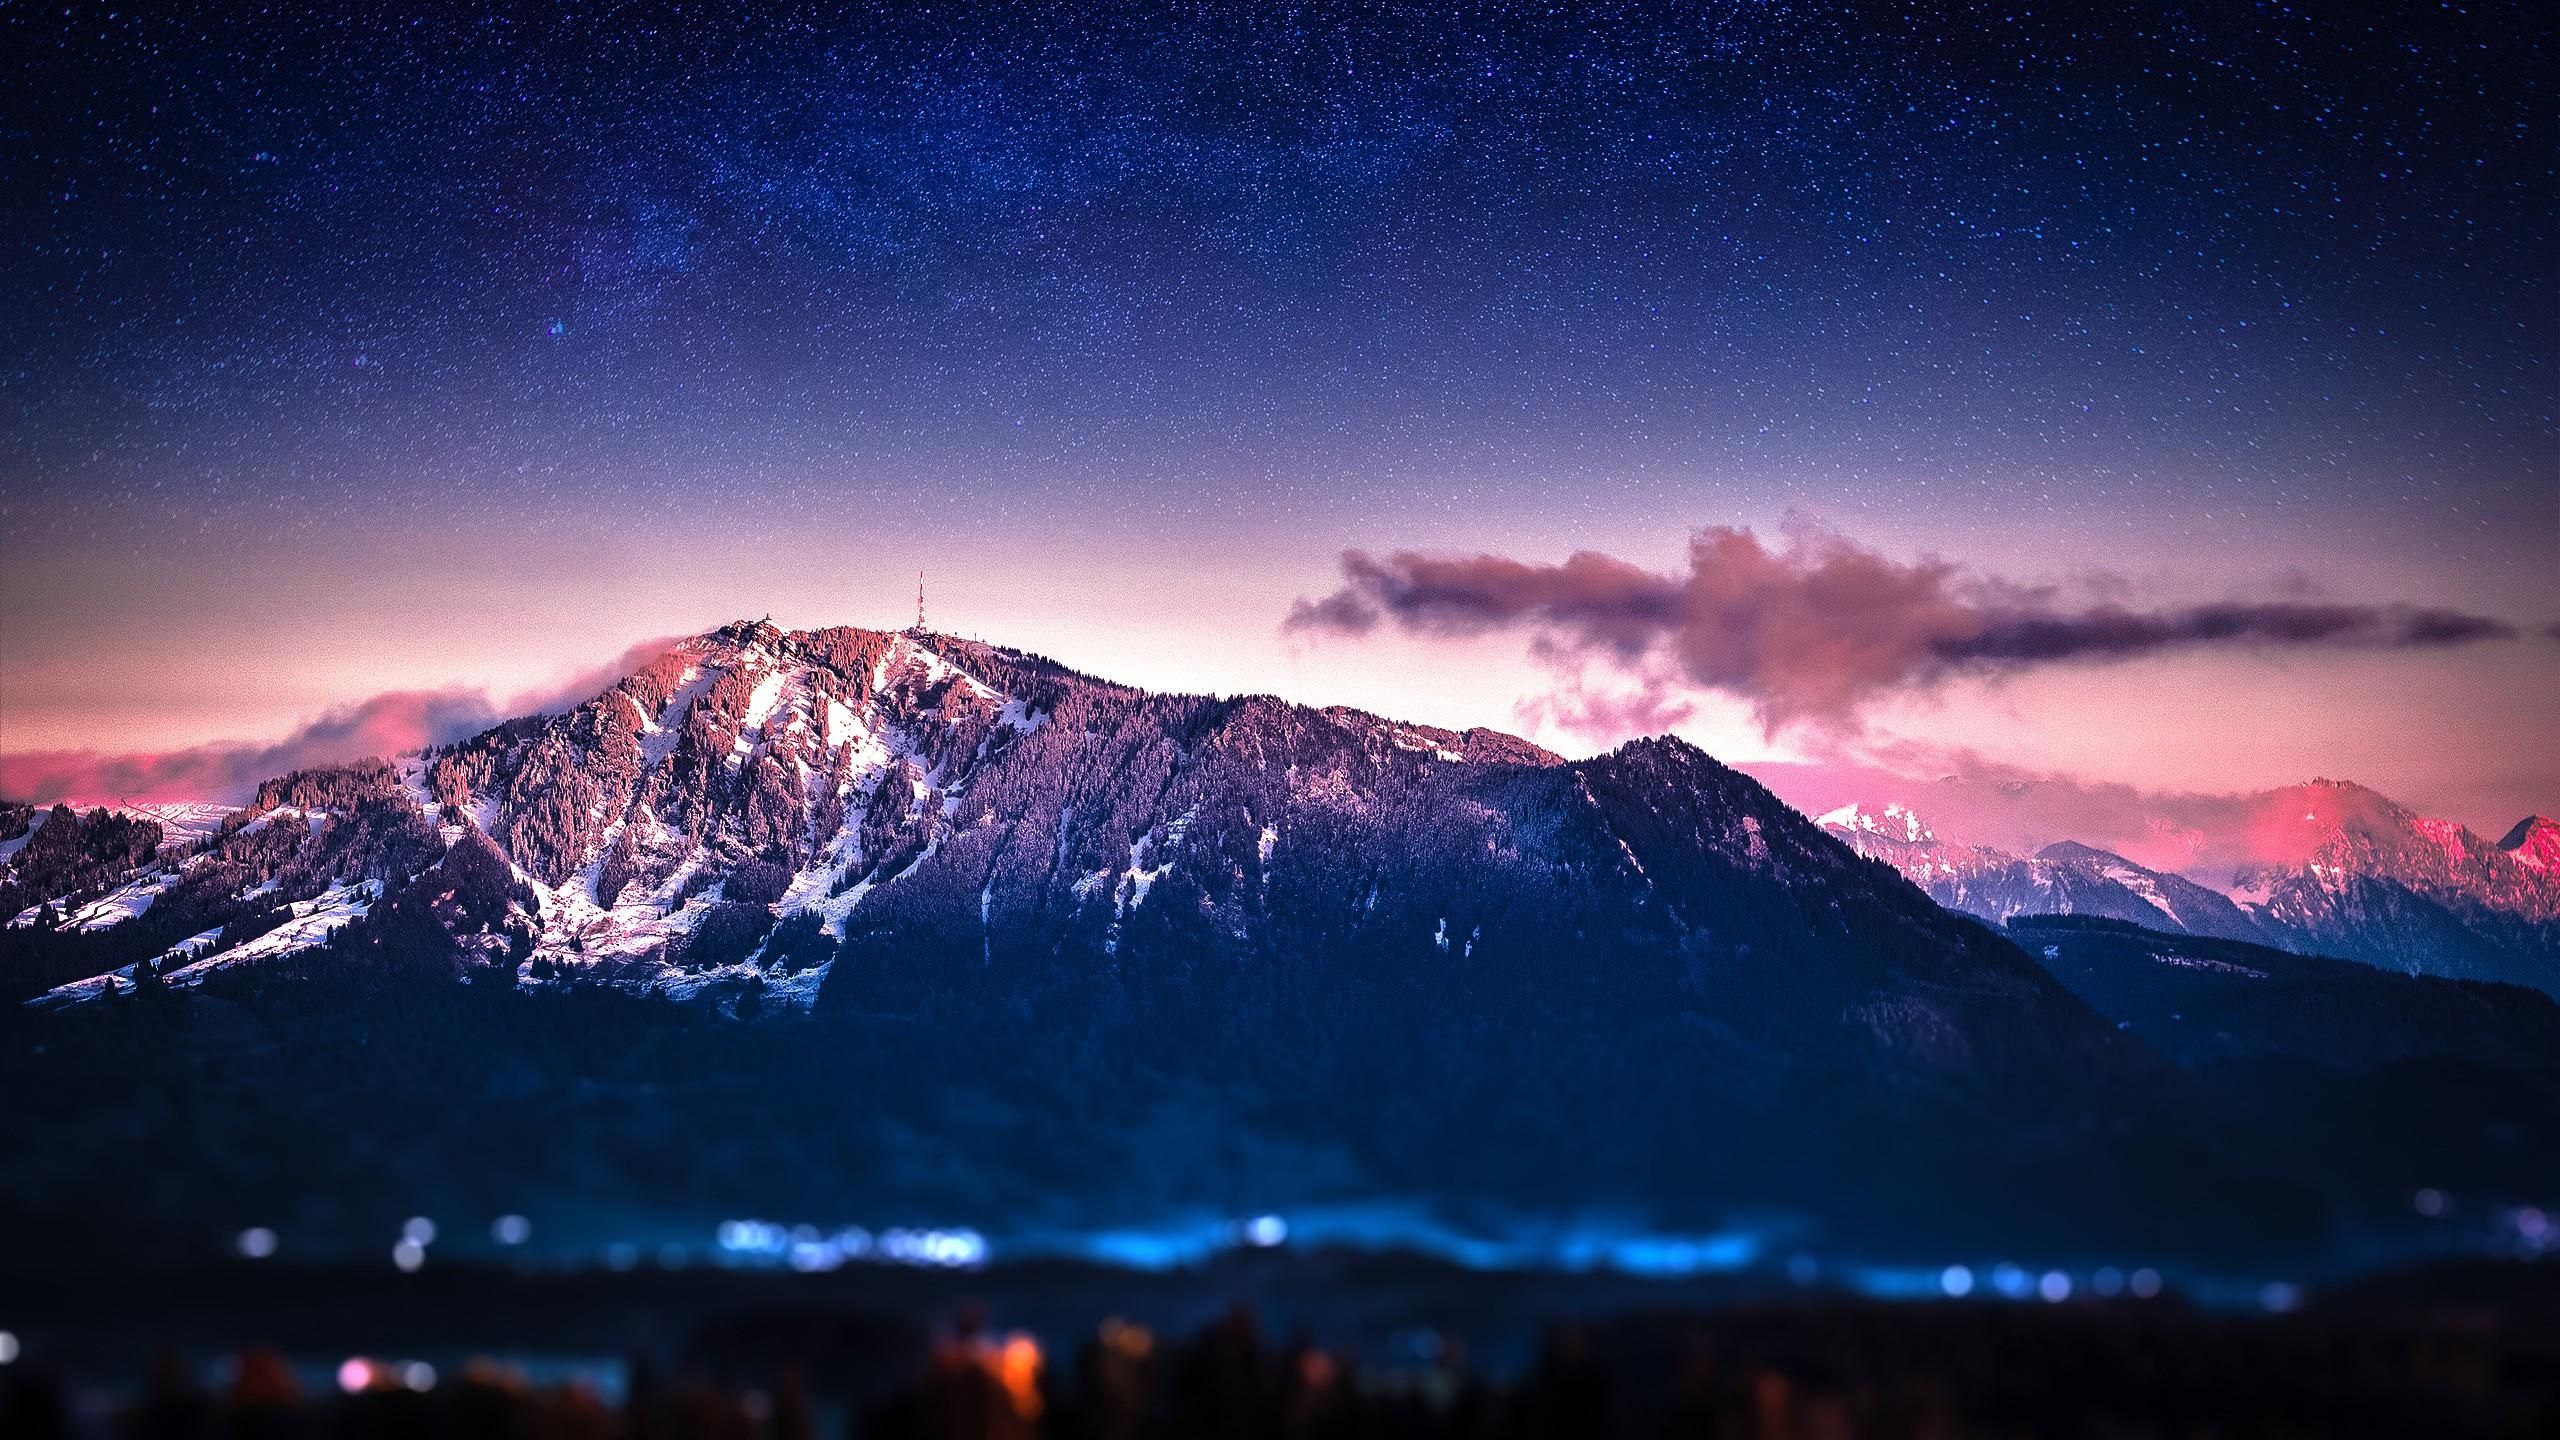 Amazing Wallpaper Mountain Blurry - 10c462de63a51a149380ef9c3c69bcda  Trends_866551.jpg